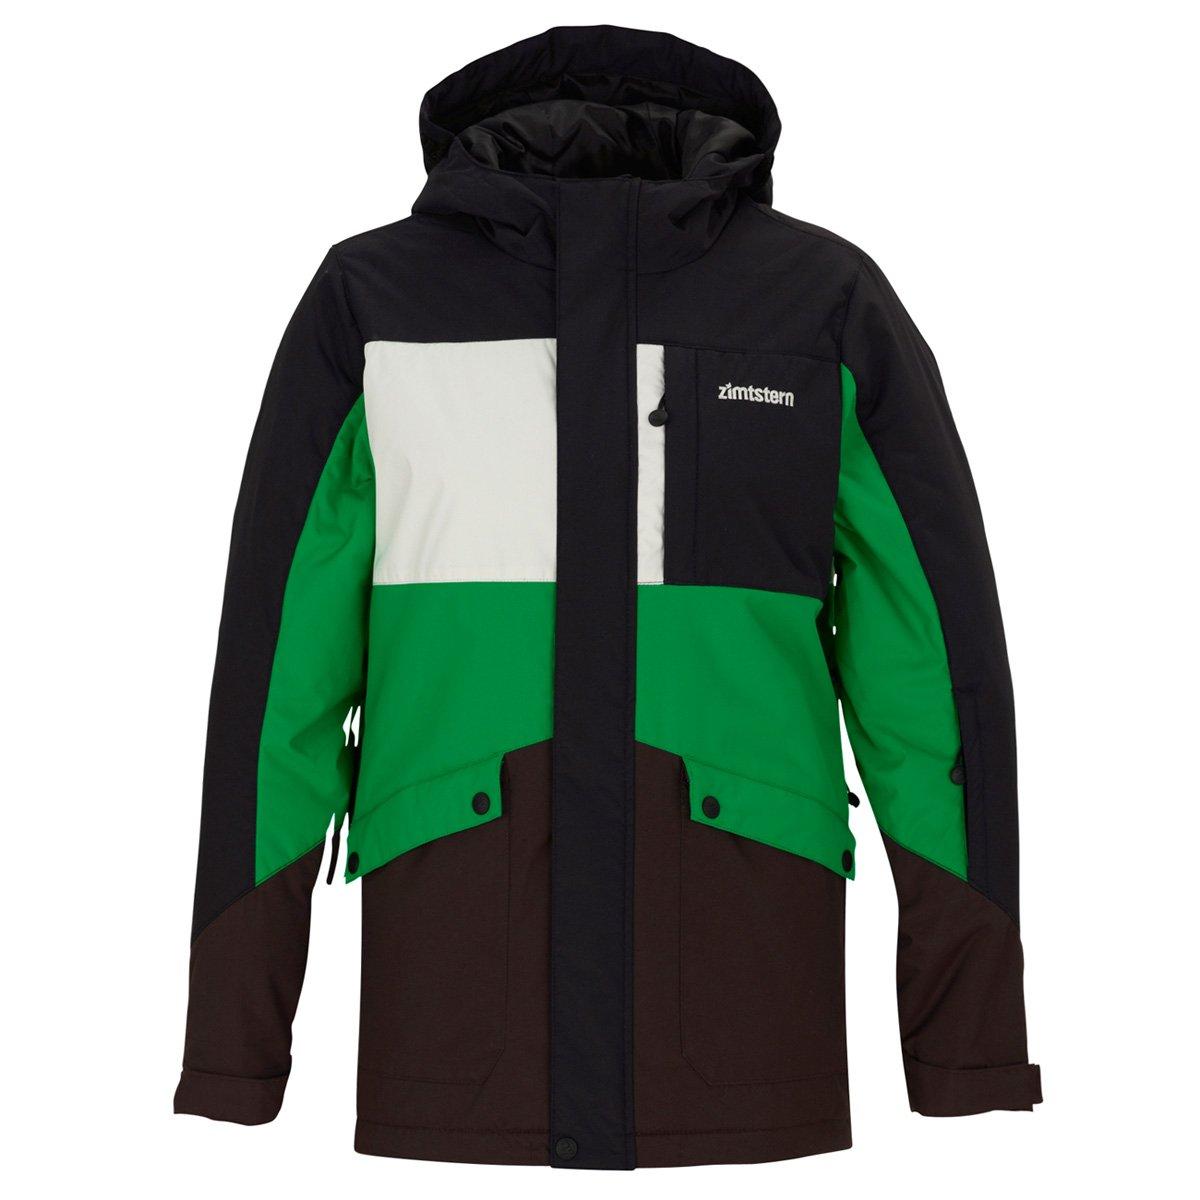 Zimtstern Kinder Snow Jacket Tim Boys günstig kaufen